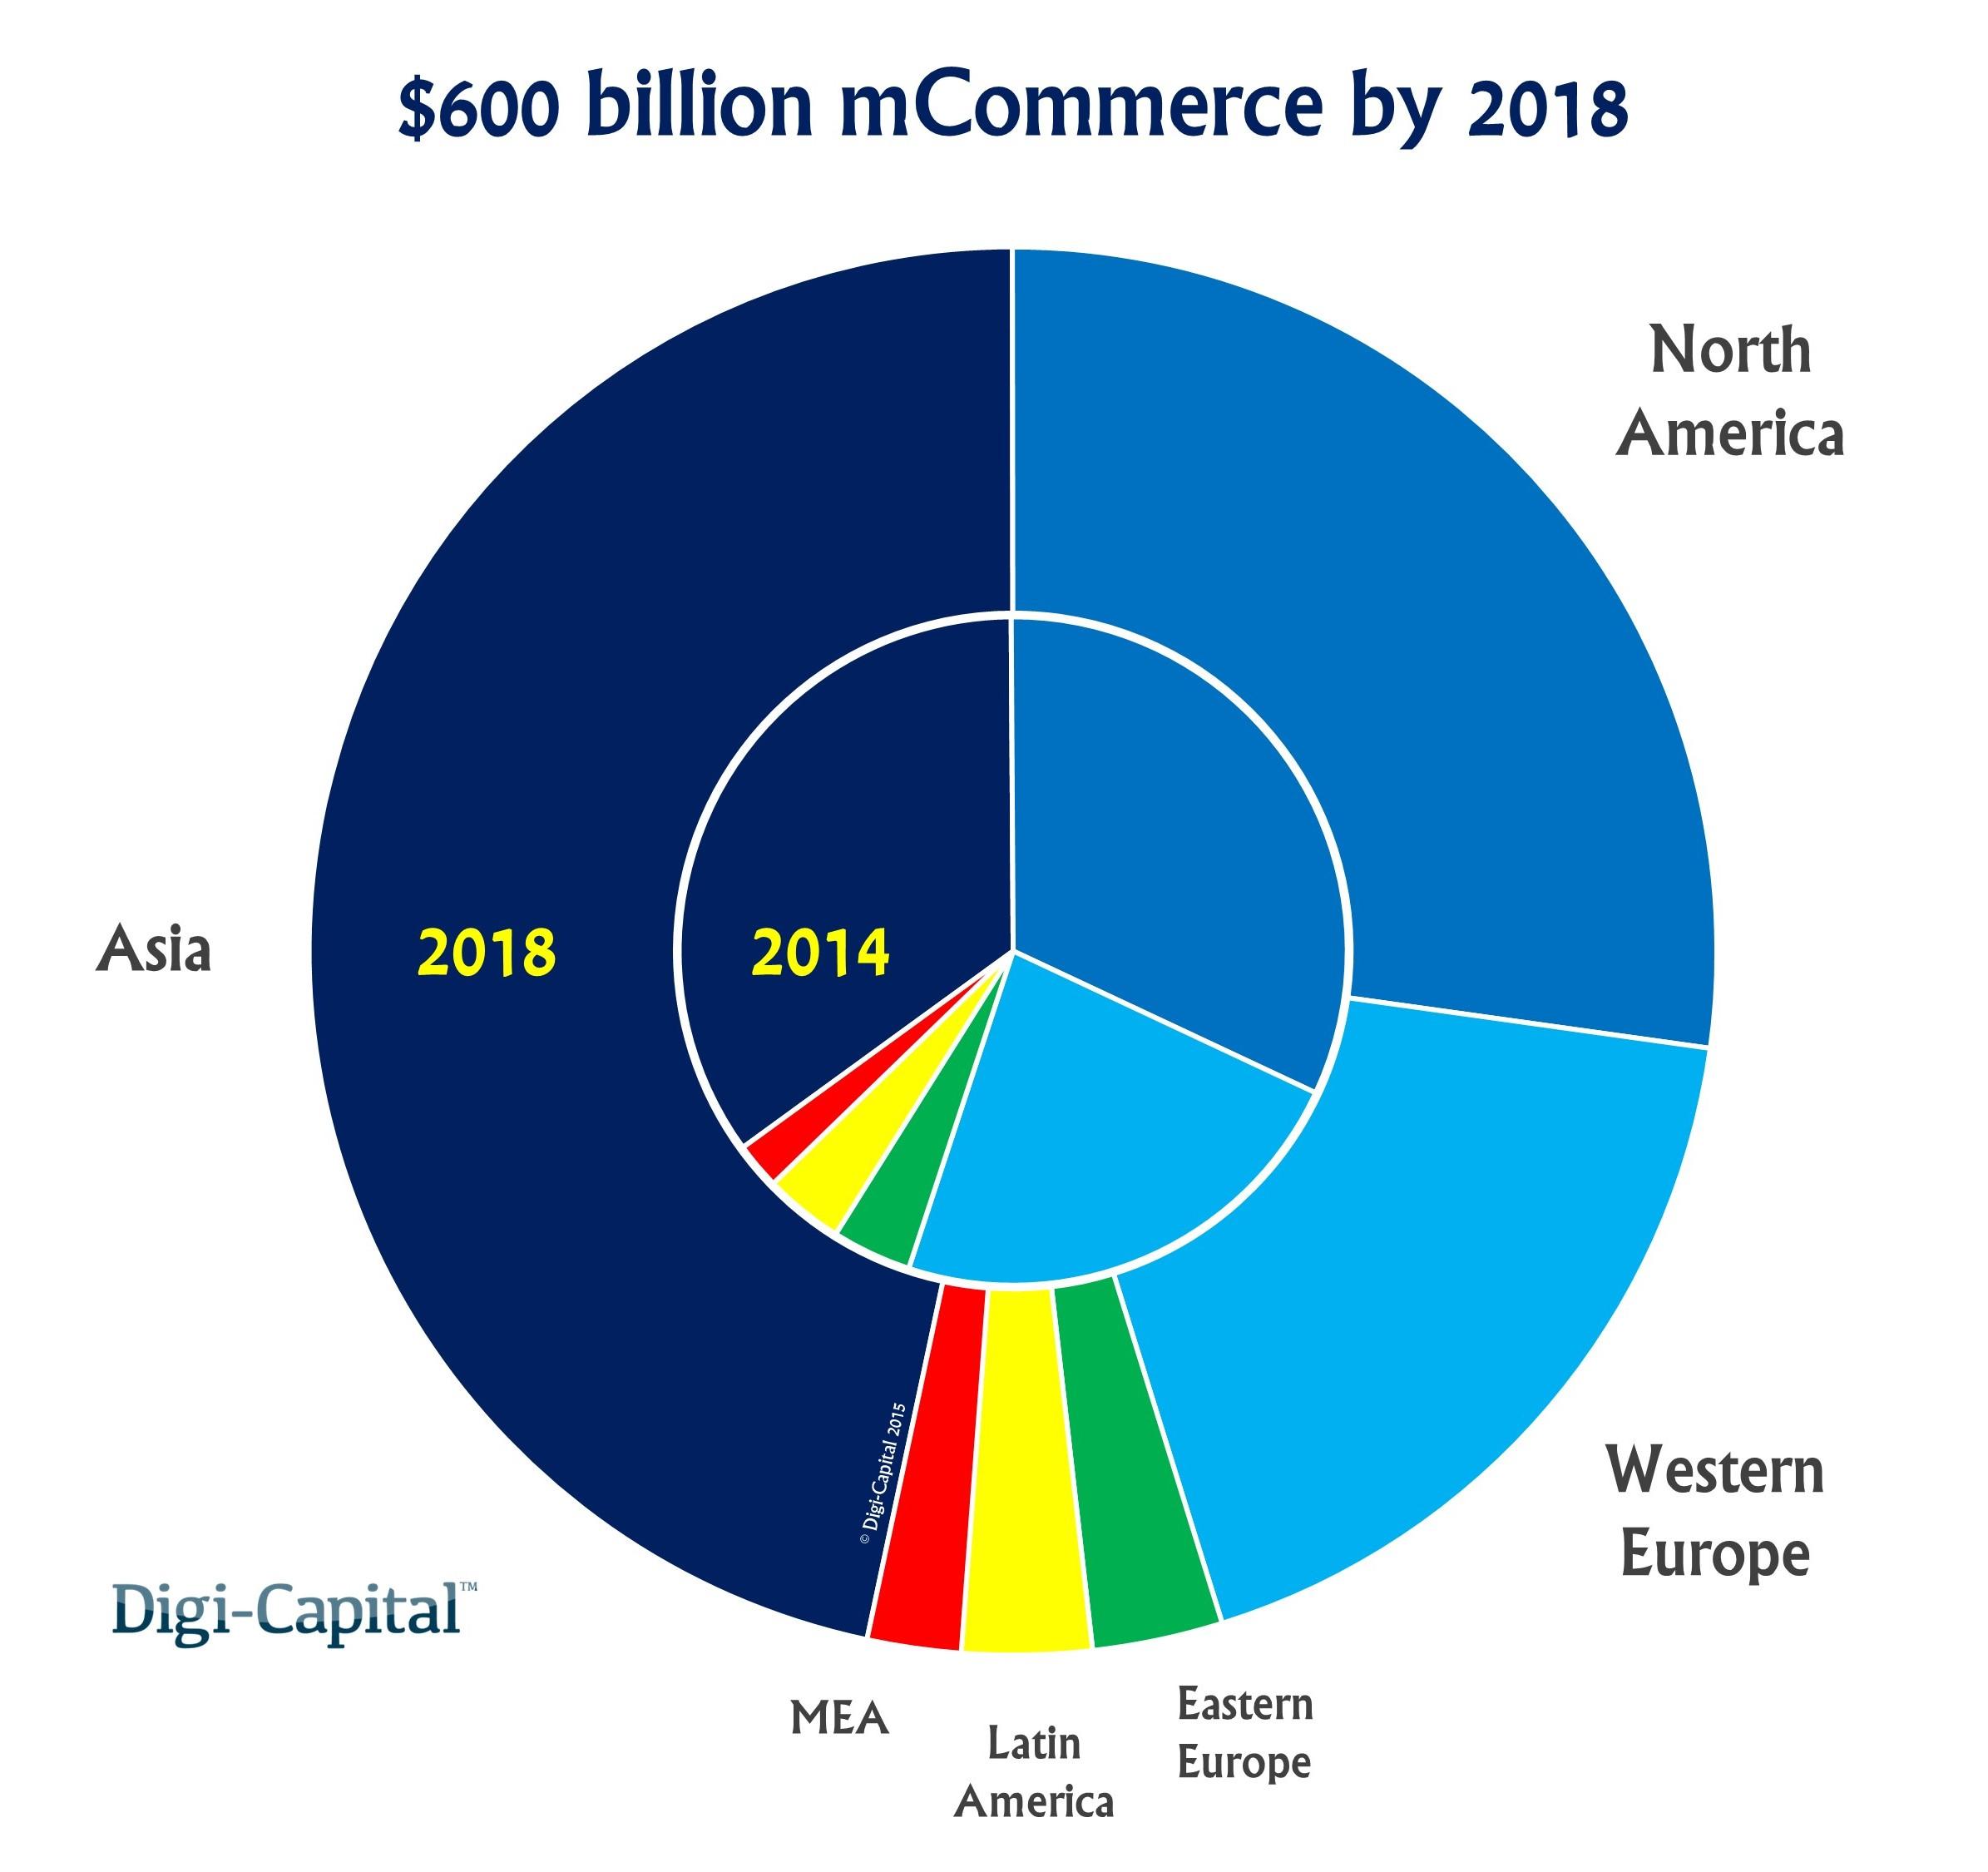 mCommerce revenue forecast